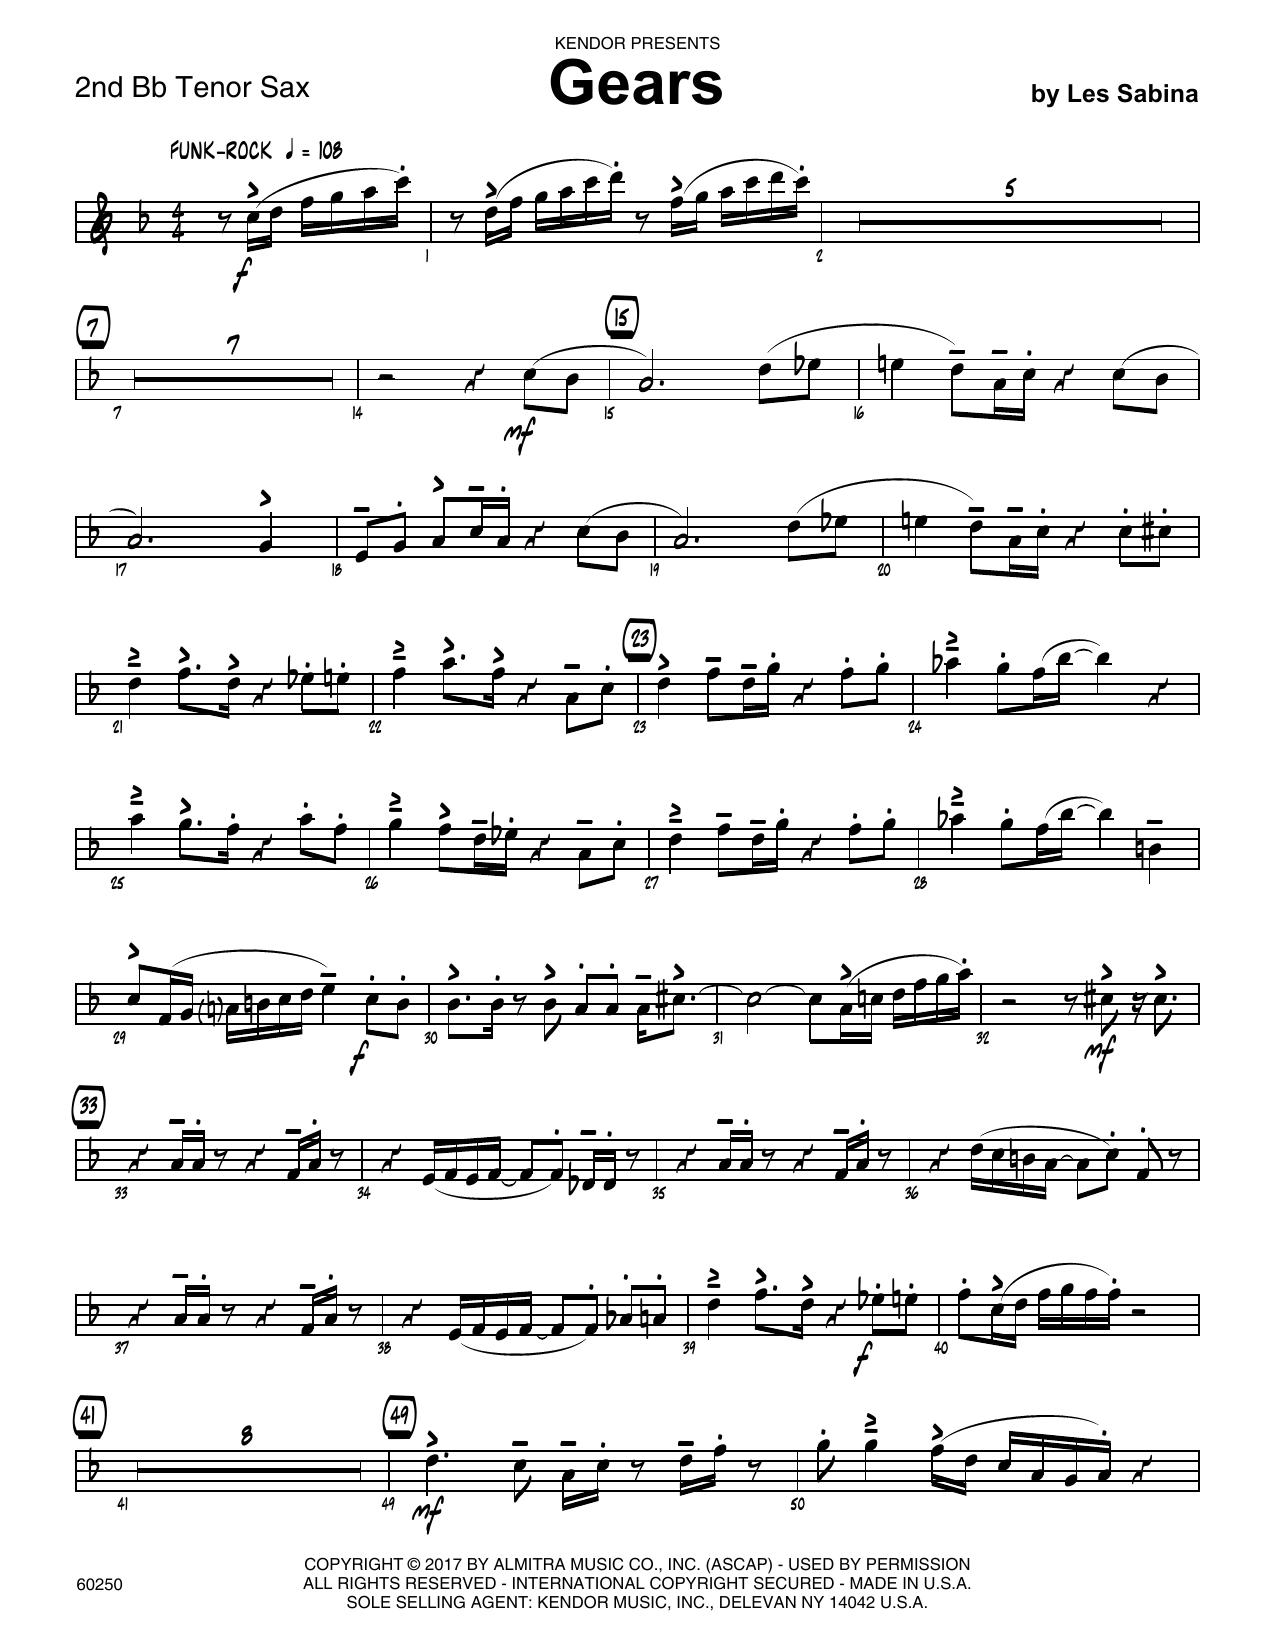 Les Sabina Gears - 2nd Bb Tenor Saxophone sheet music notes printable PDF score